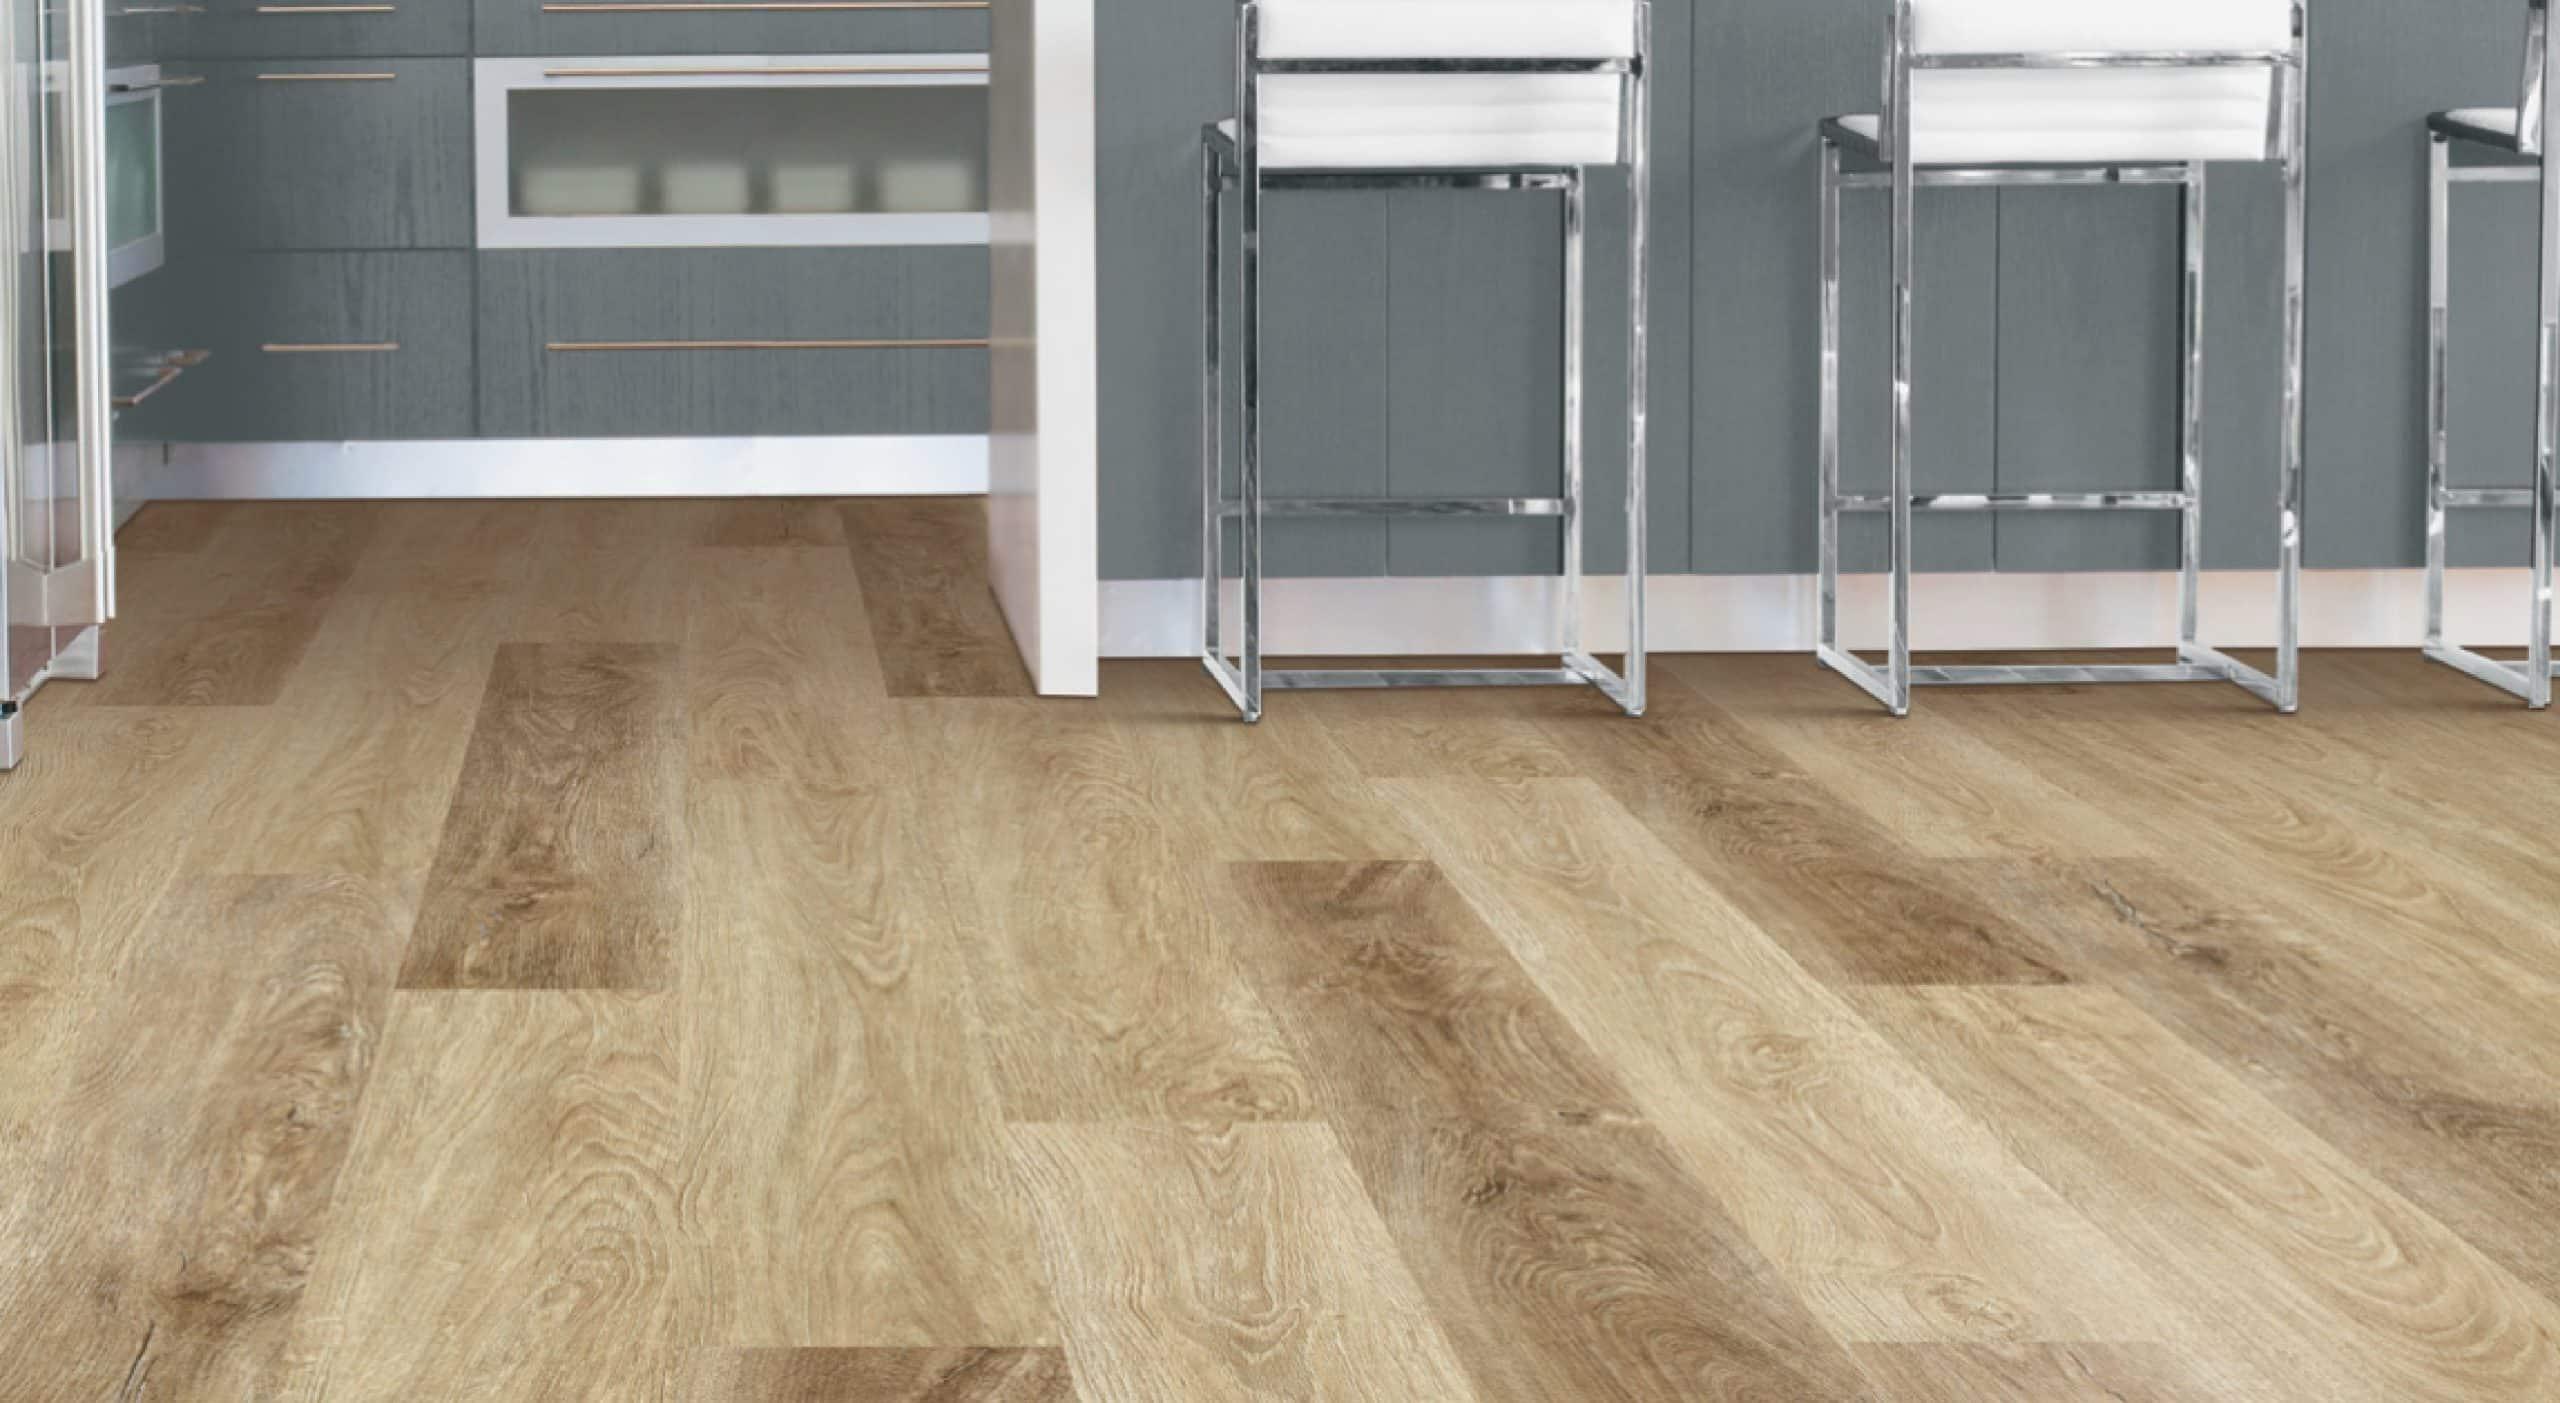 Absolute Flooring Luxury Vinyl Plank Flooring Services